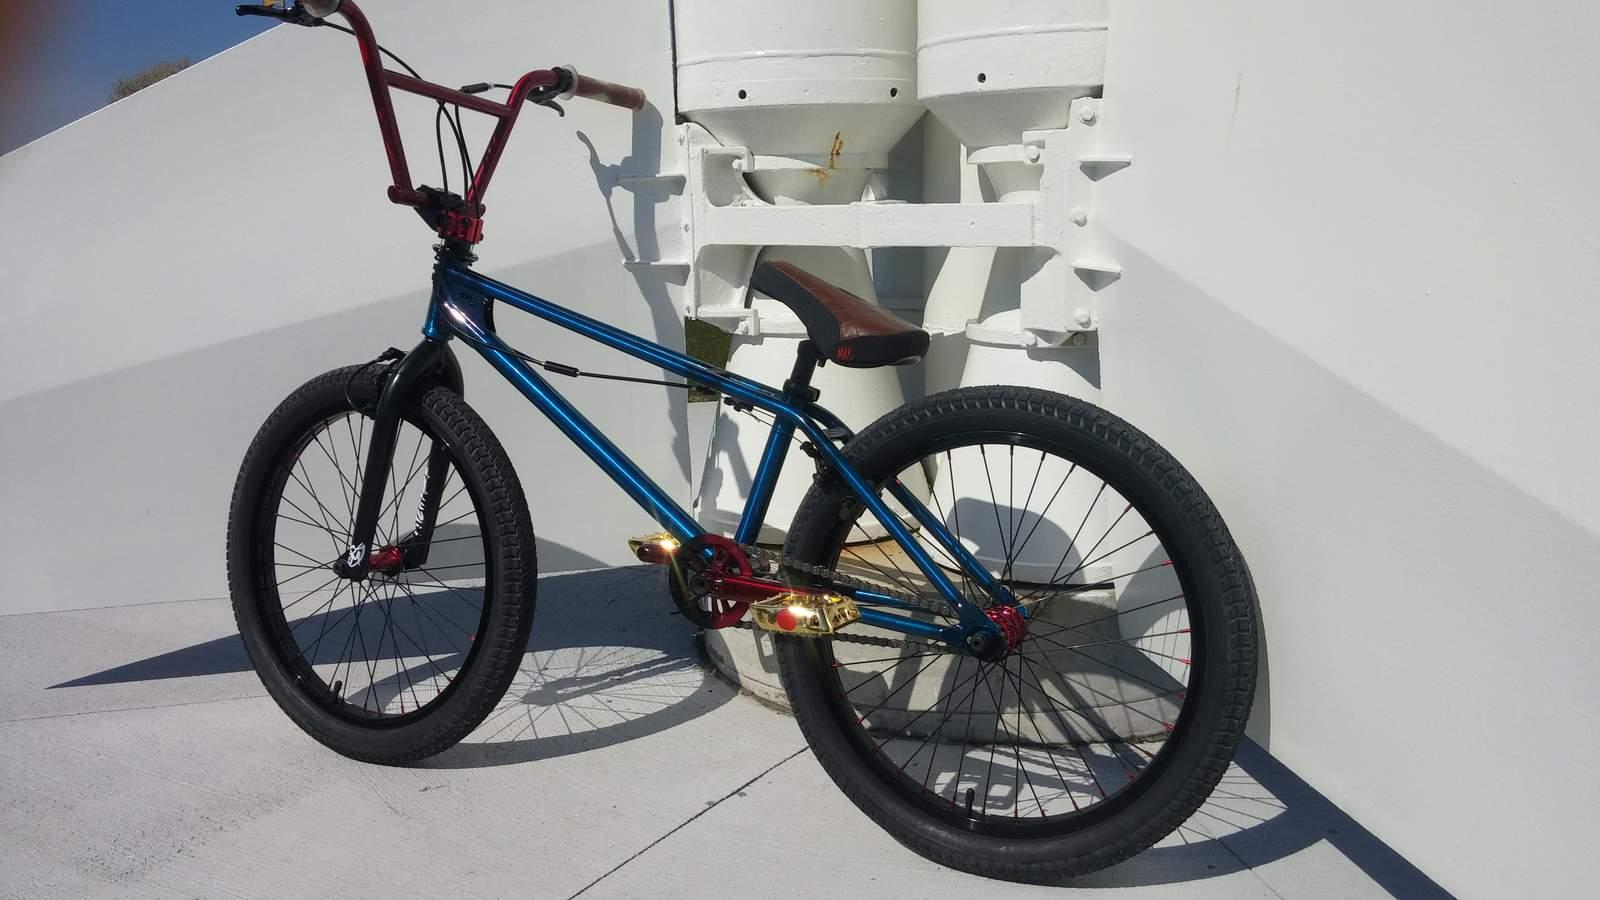 https://s3.amazonaws.com/uploads.bmxmuseum.com/user-images/172379/meltons-cycle-twin-peeks-22-trans-blue-1585c747fa9.jpg